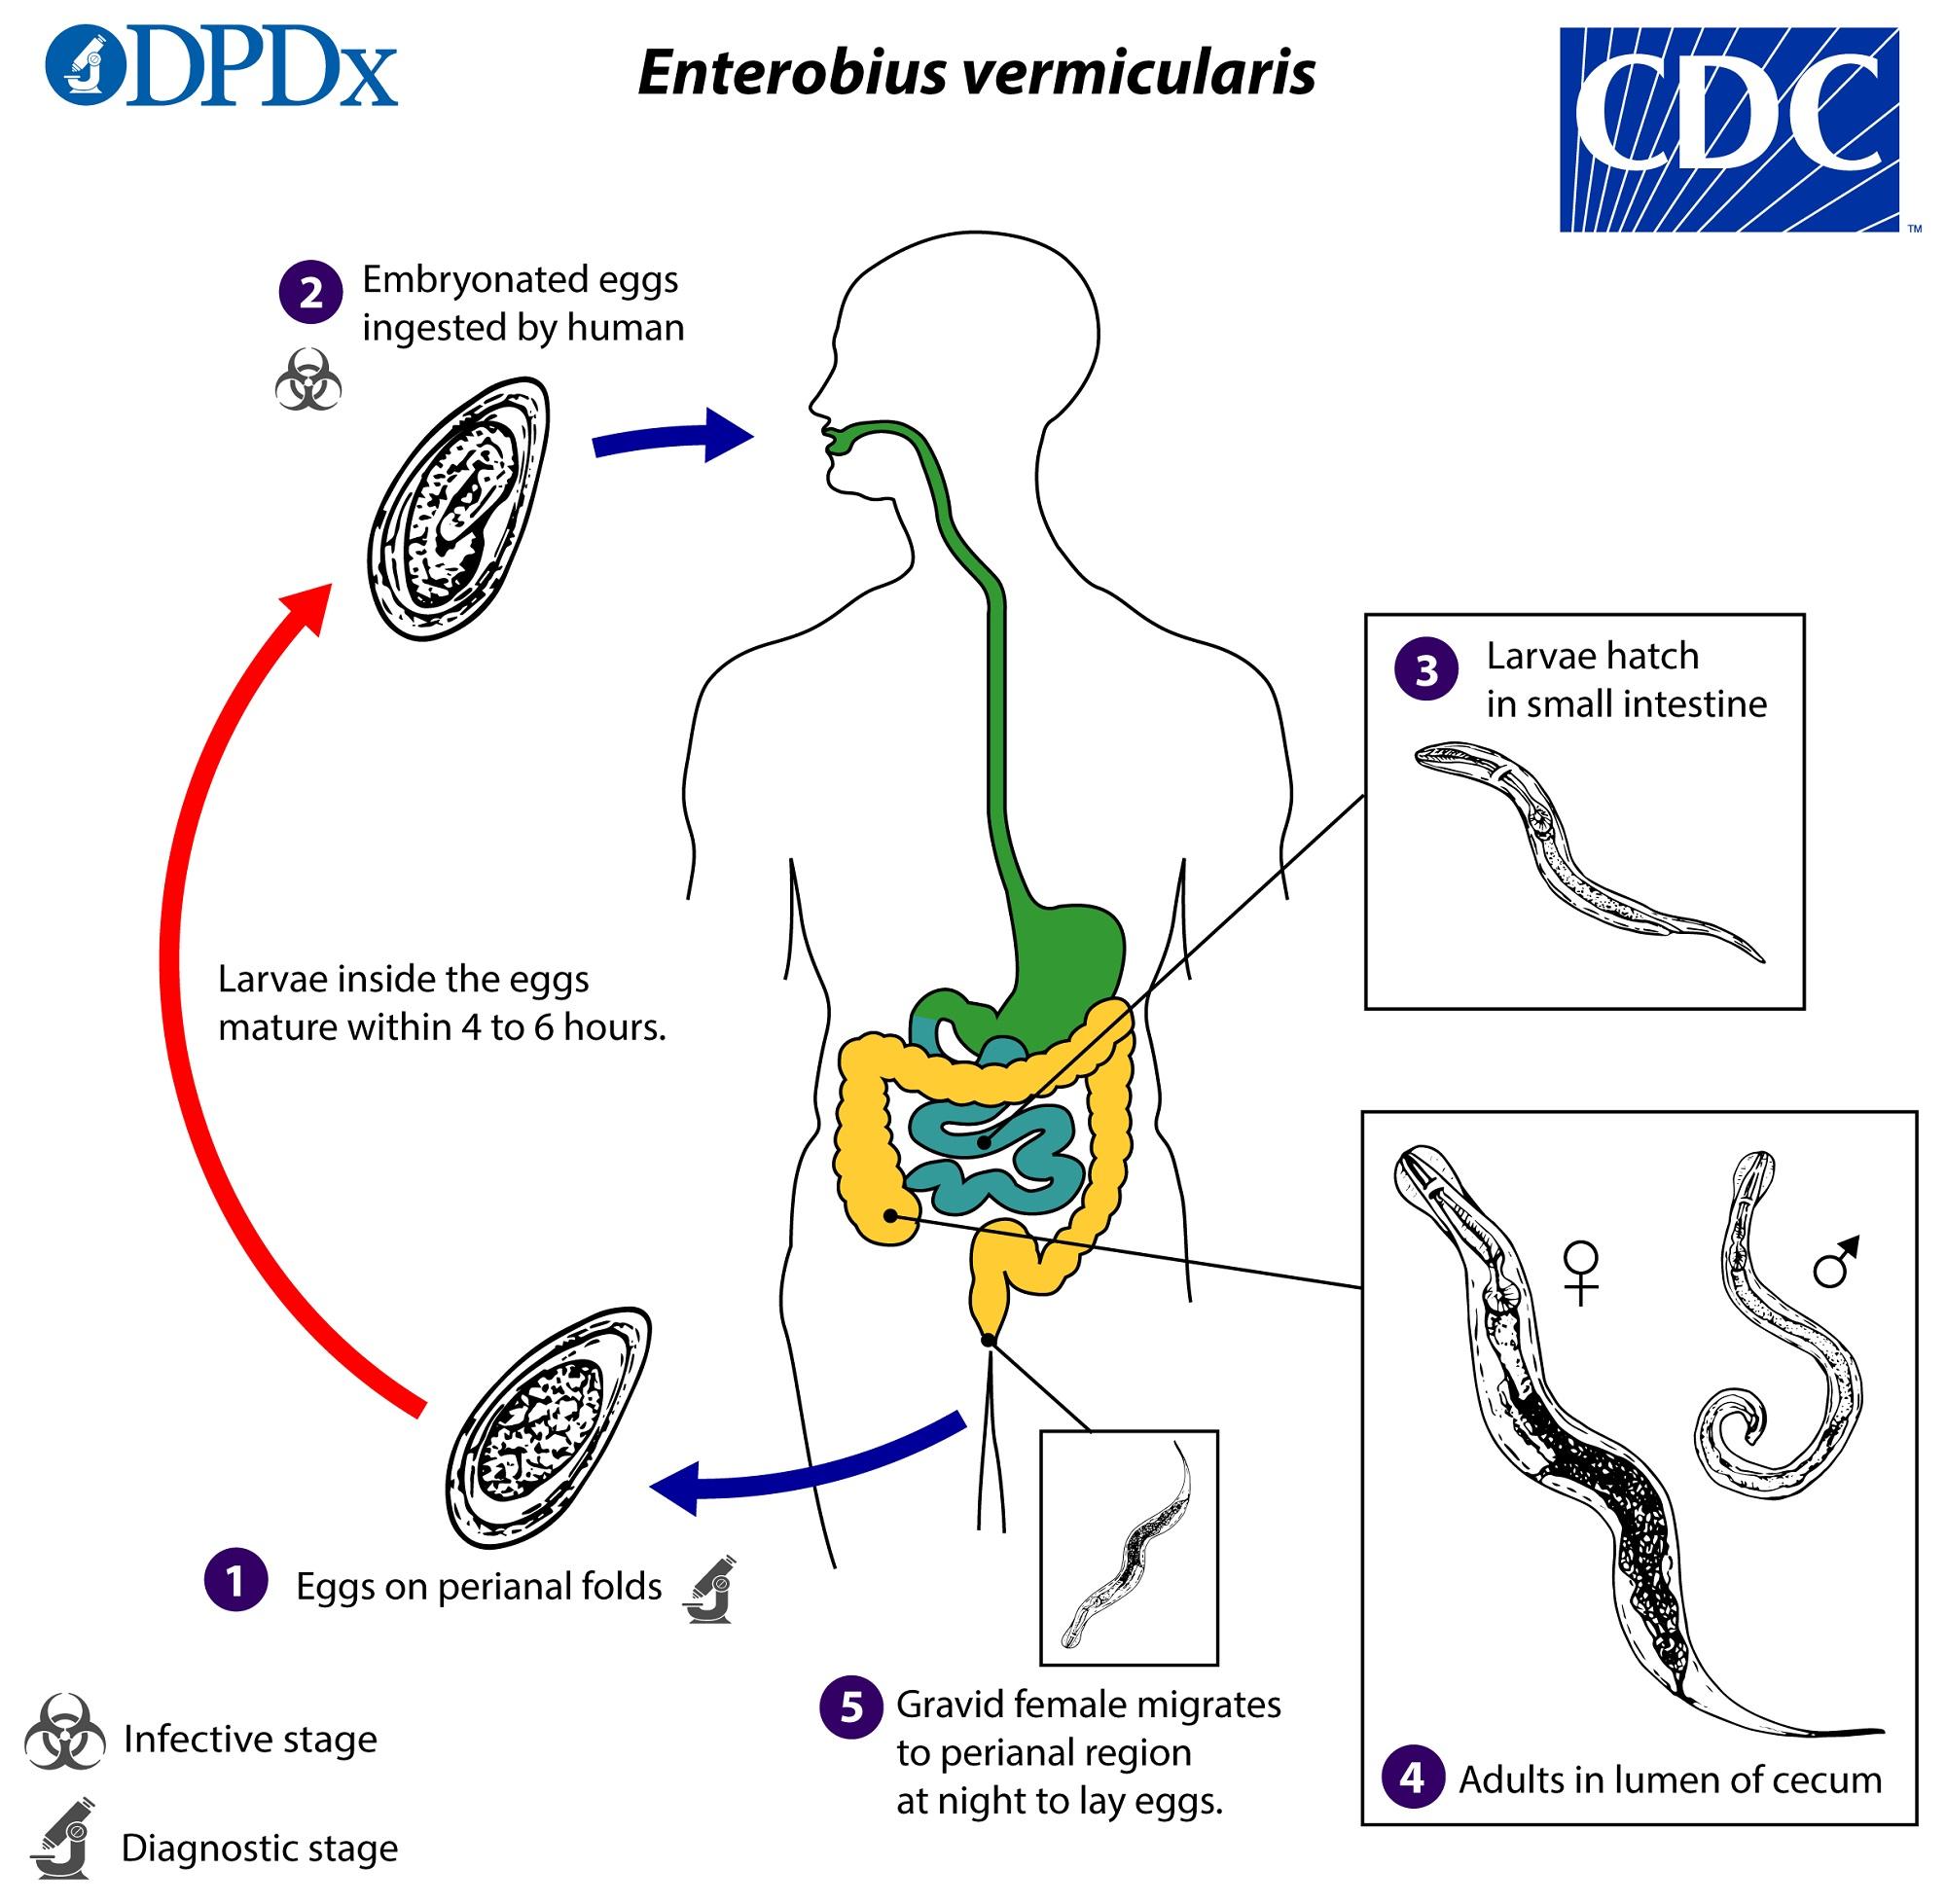 Enterobius vermicularis oxyuris, Oxyuris (enterobius) vermicularis